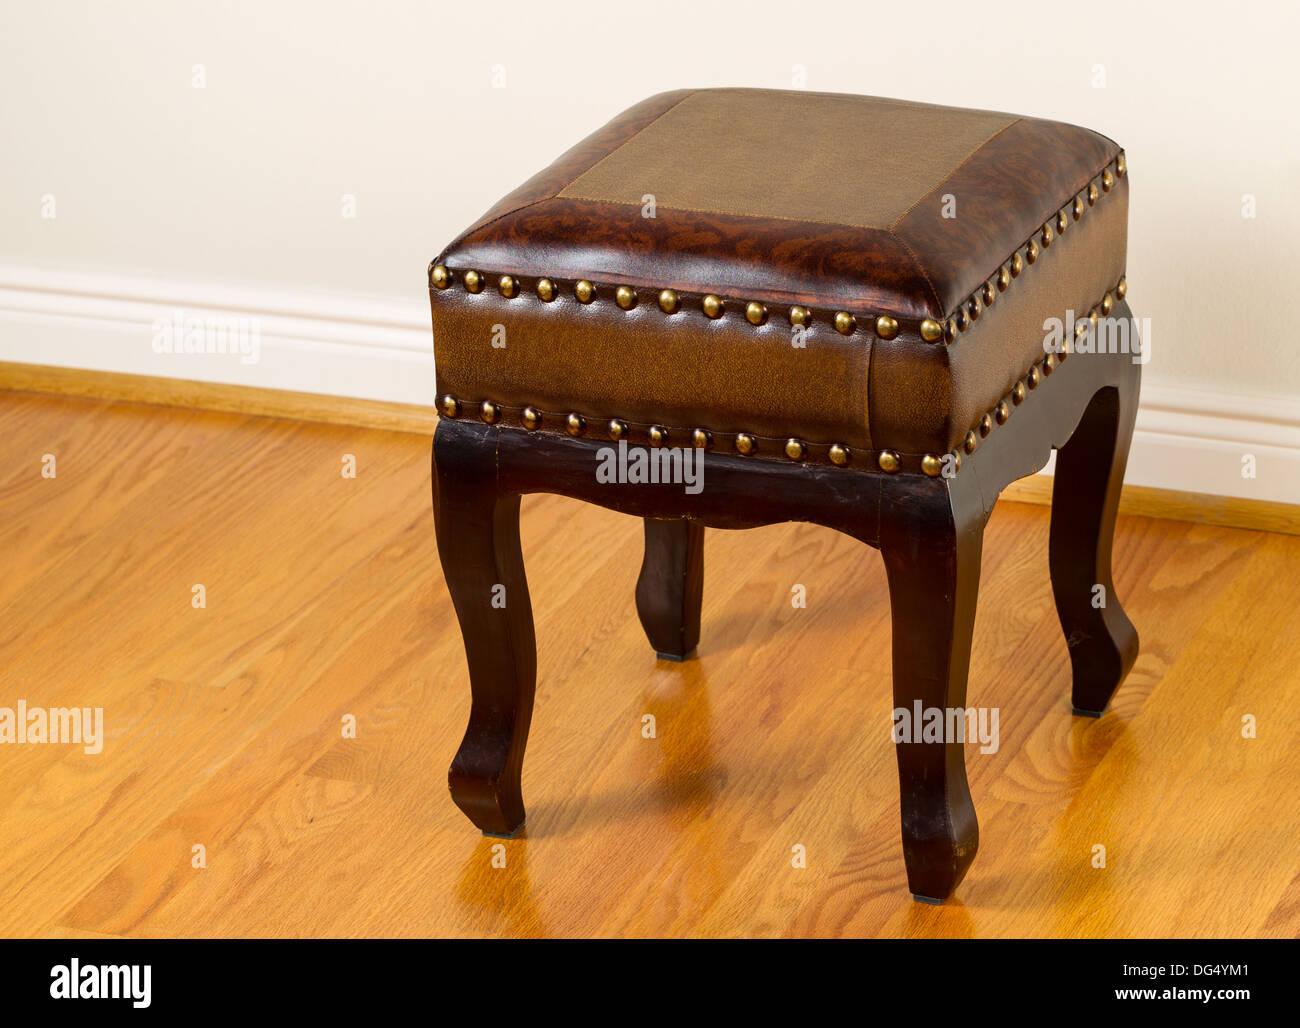 Horizontal photo of padded foot stool on red oak floors - Stock Image